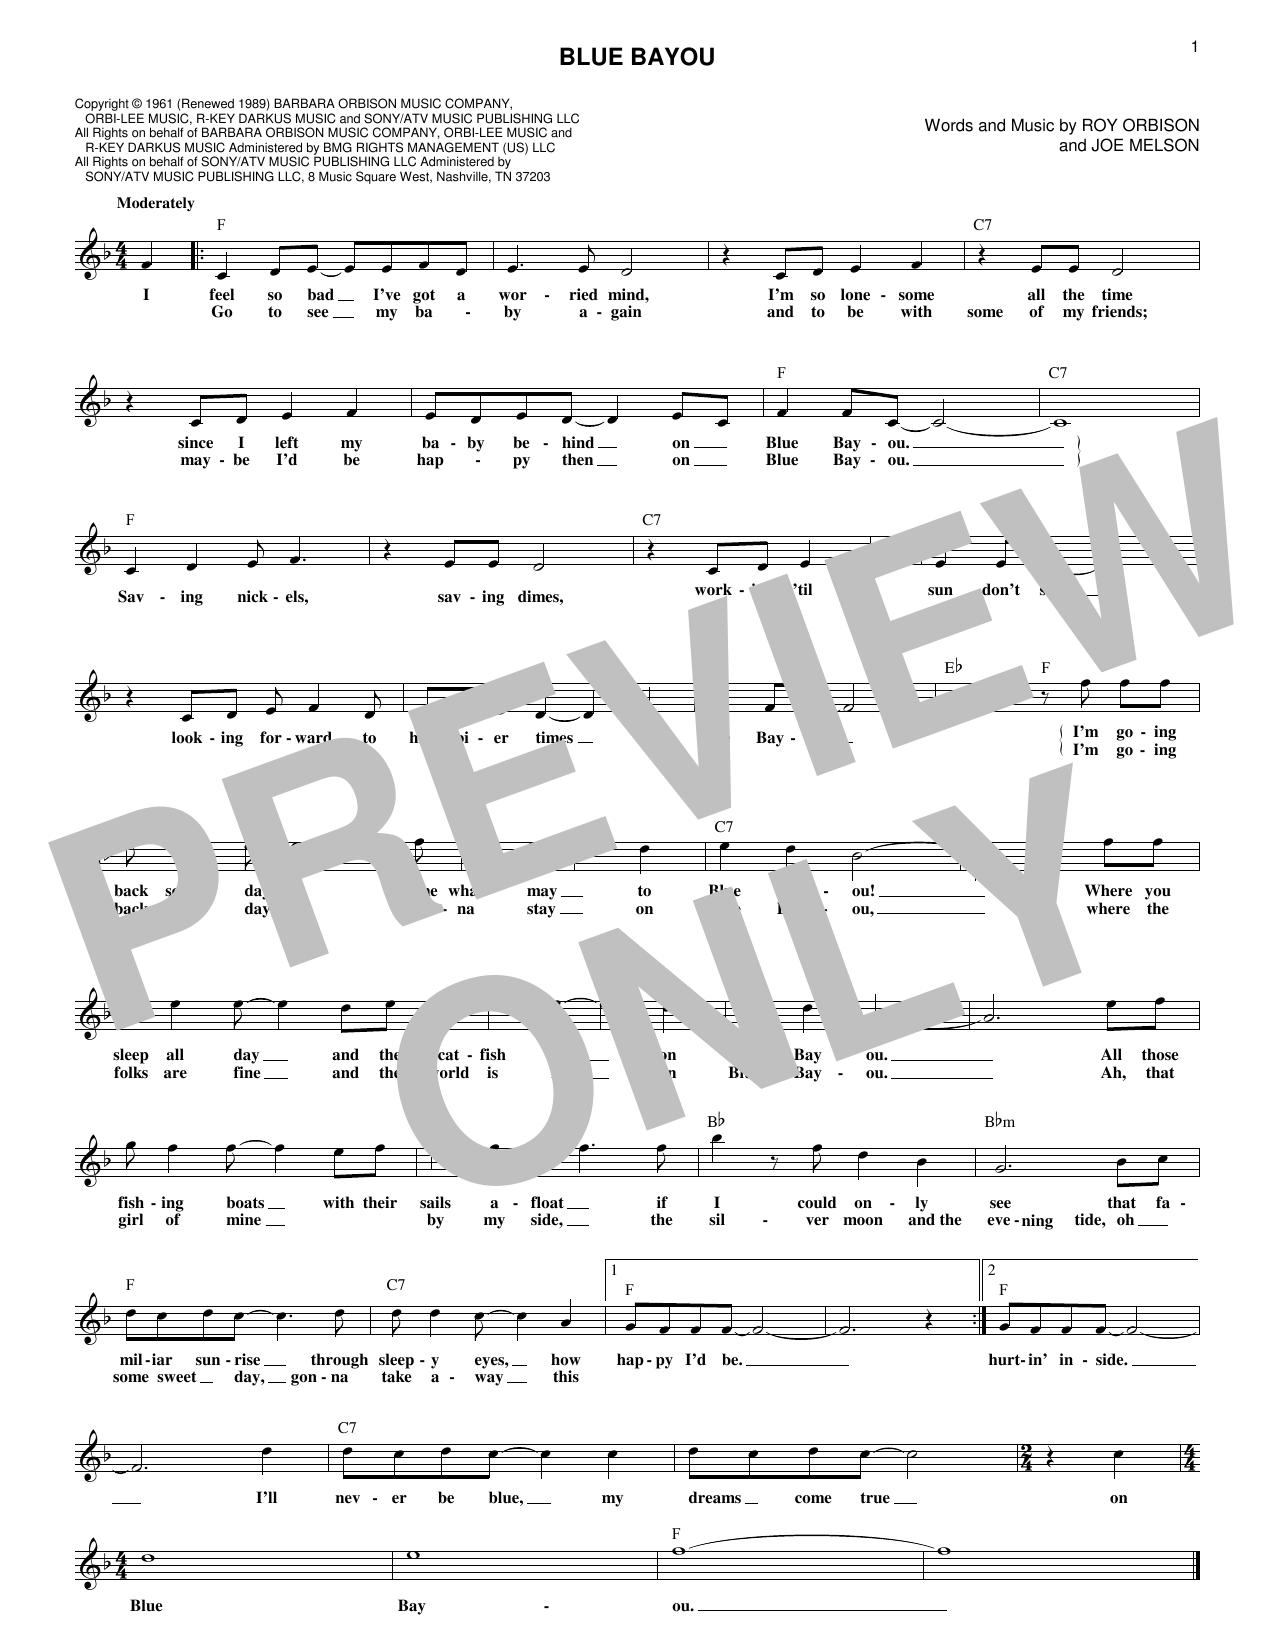 Sheet Music Digital Files To Print Licensed Roy Orbison Digital